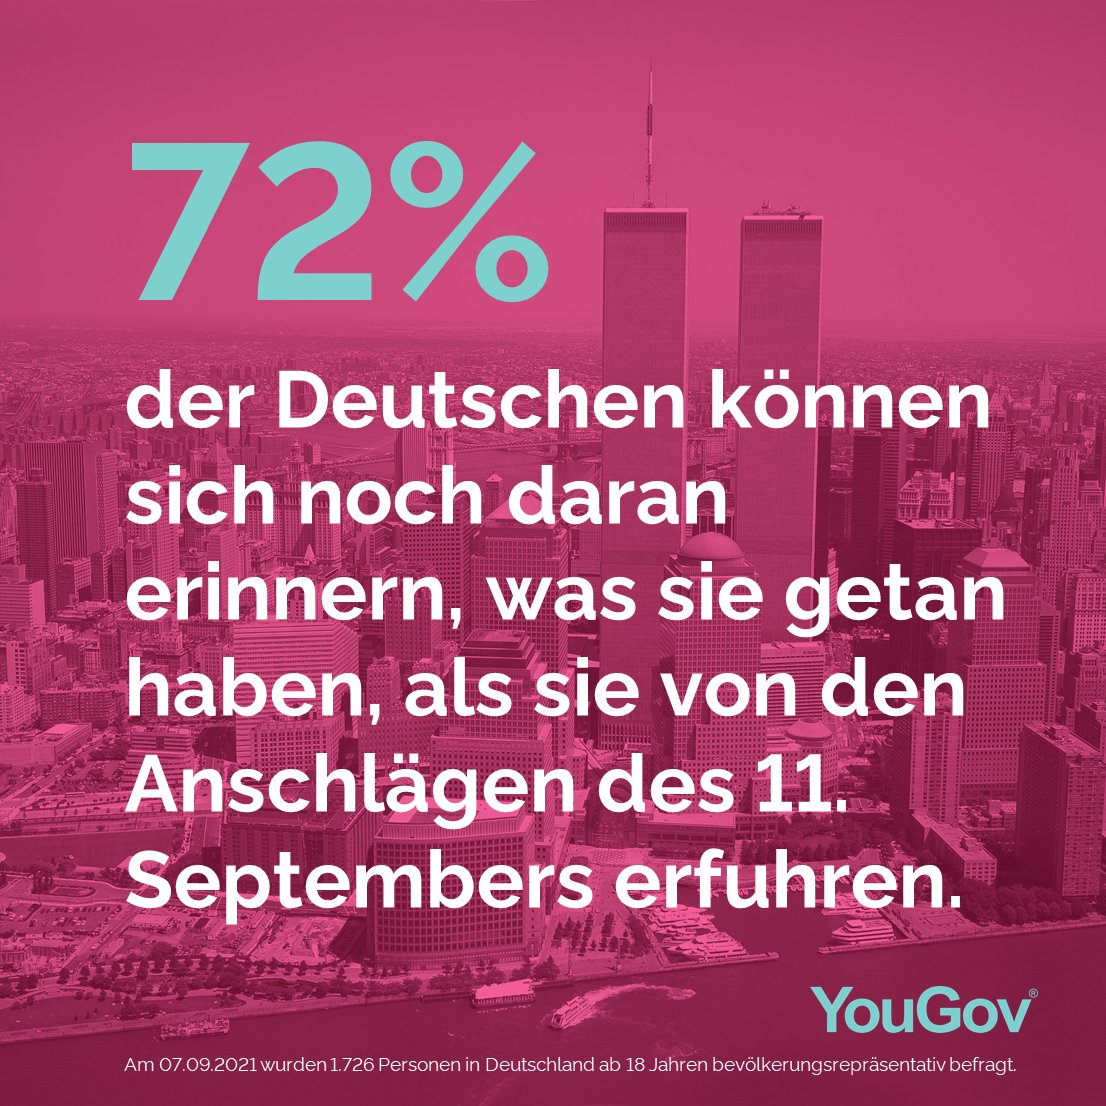 YouGov Deutschland YouGov DE   Twitter